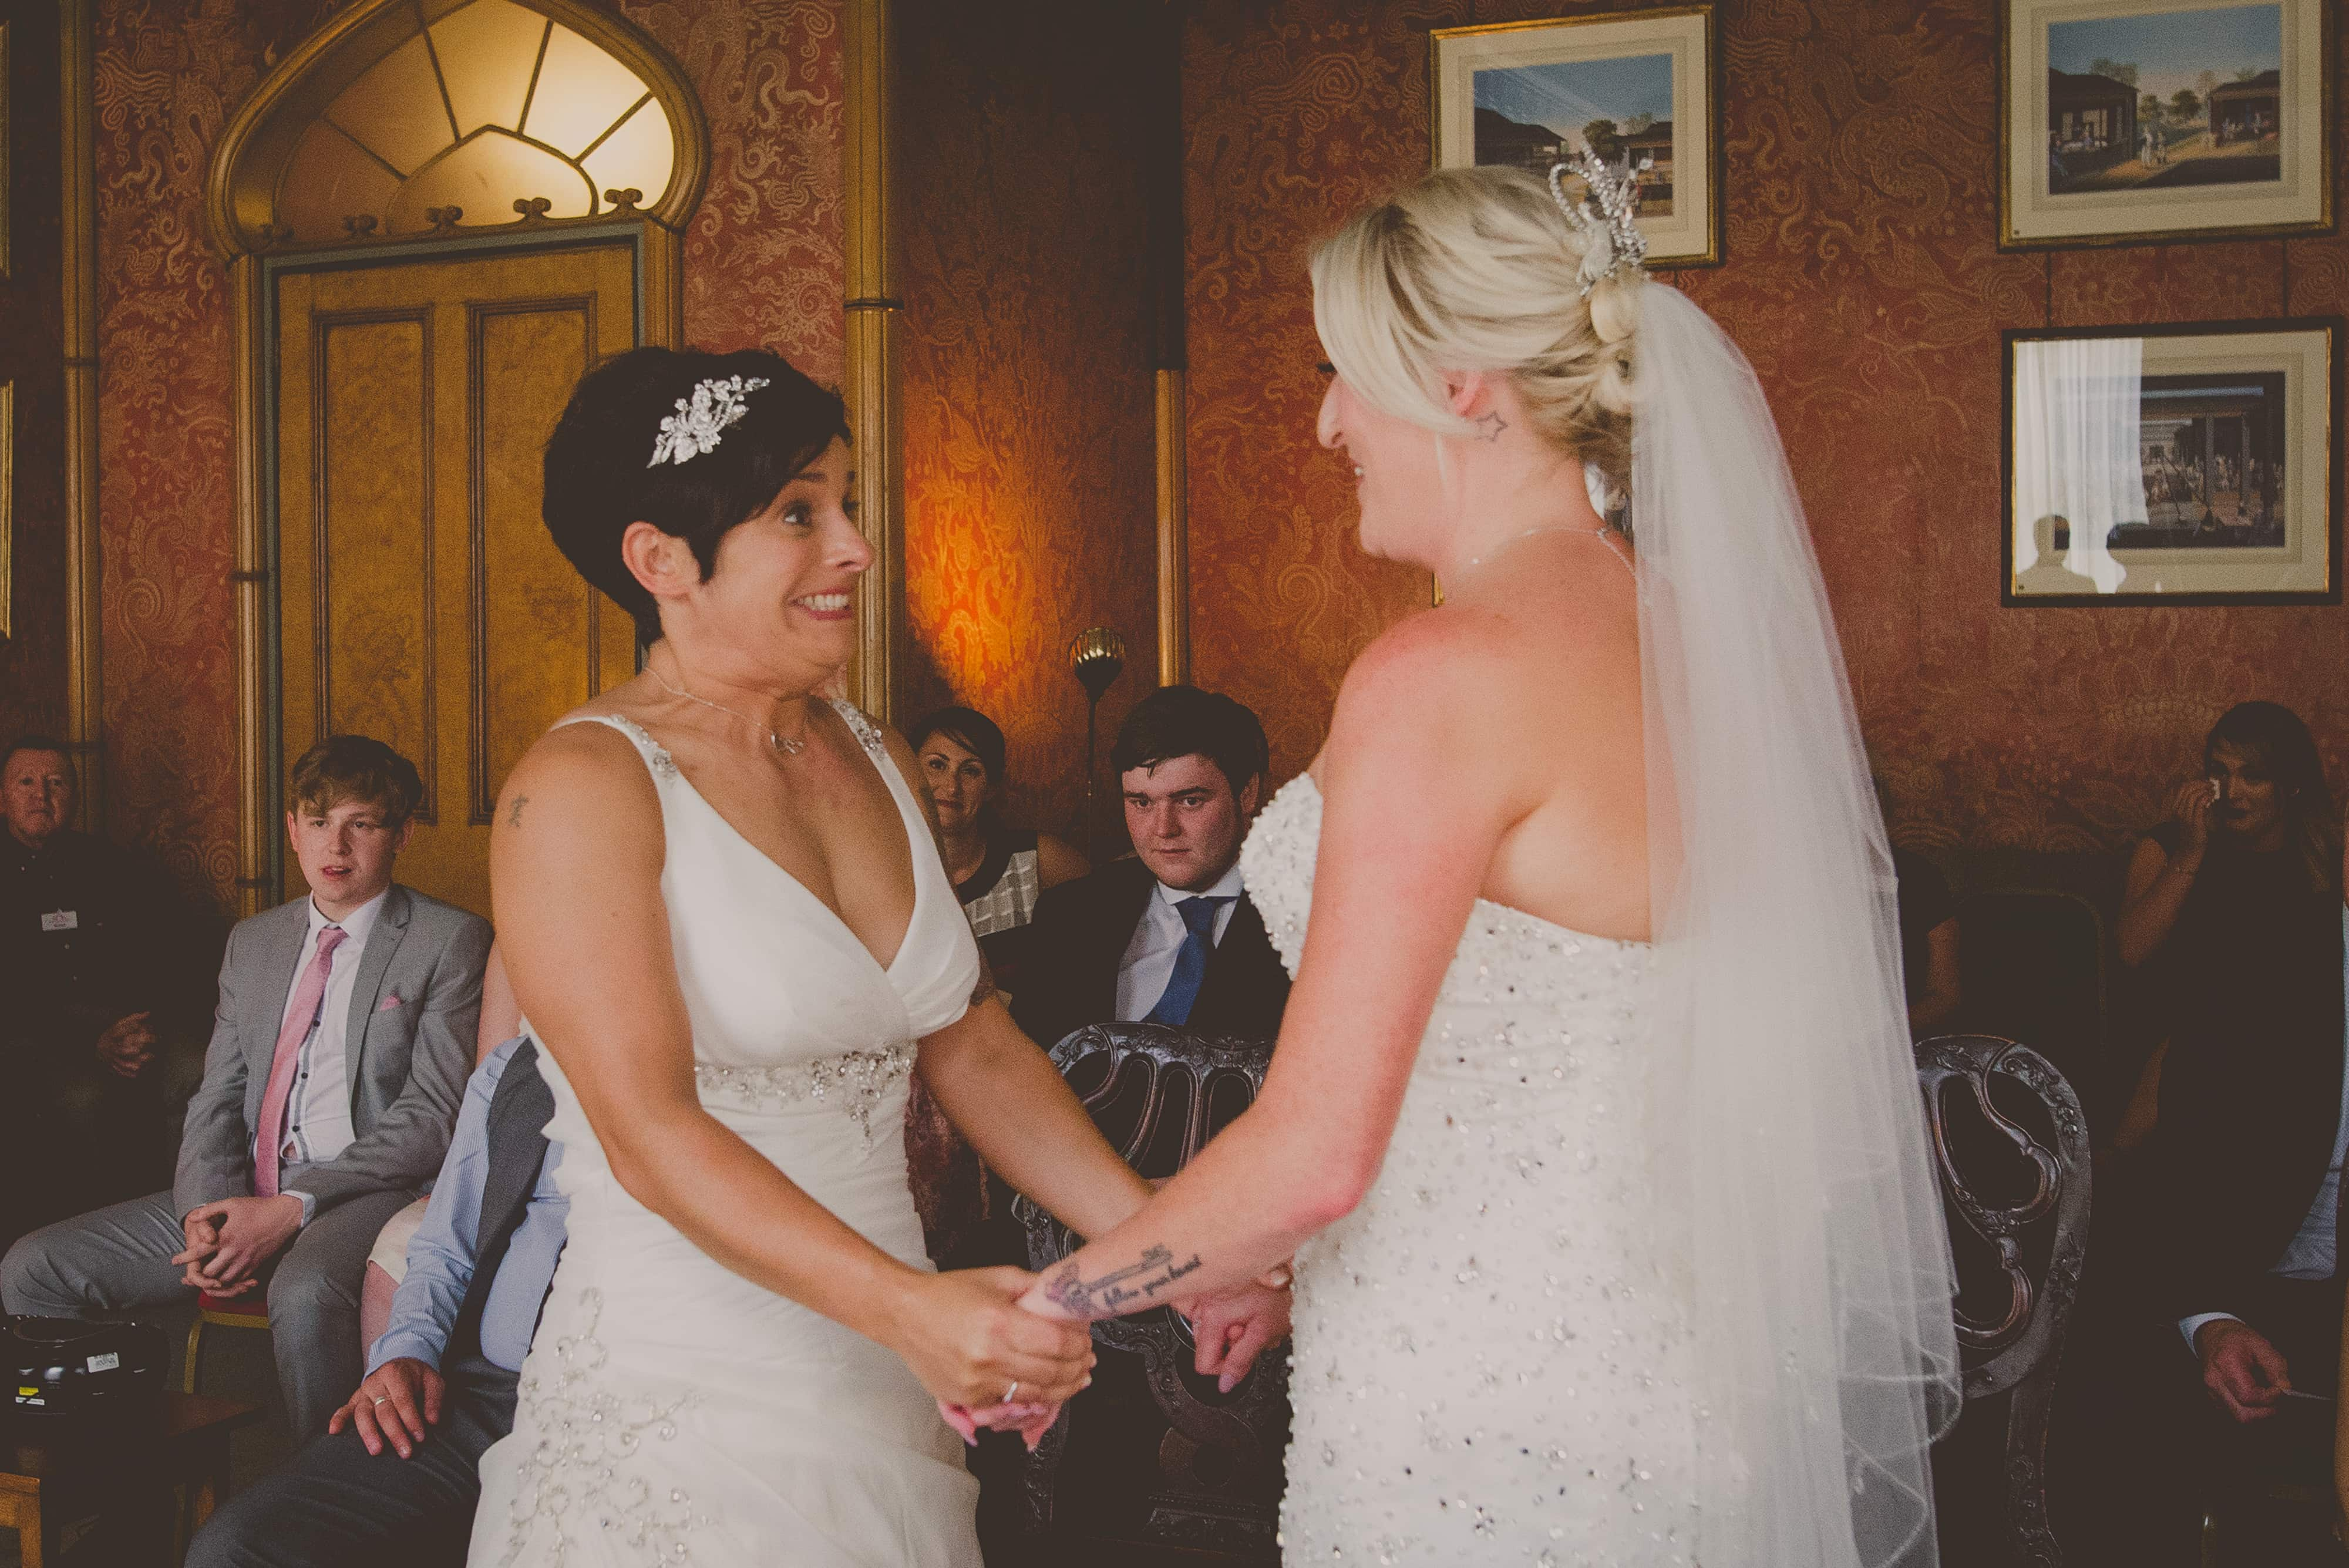 brighton pavillion wedding same sex wedding gay wedding